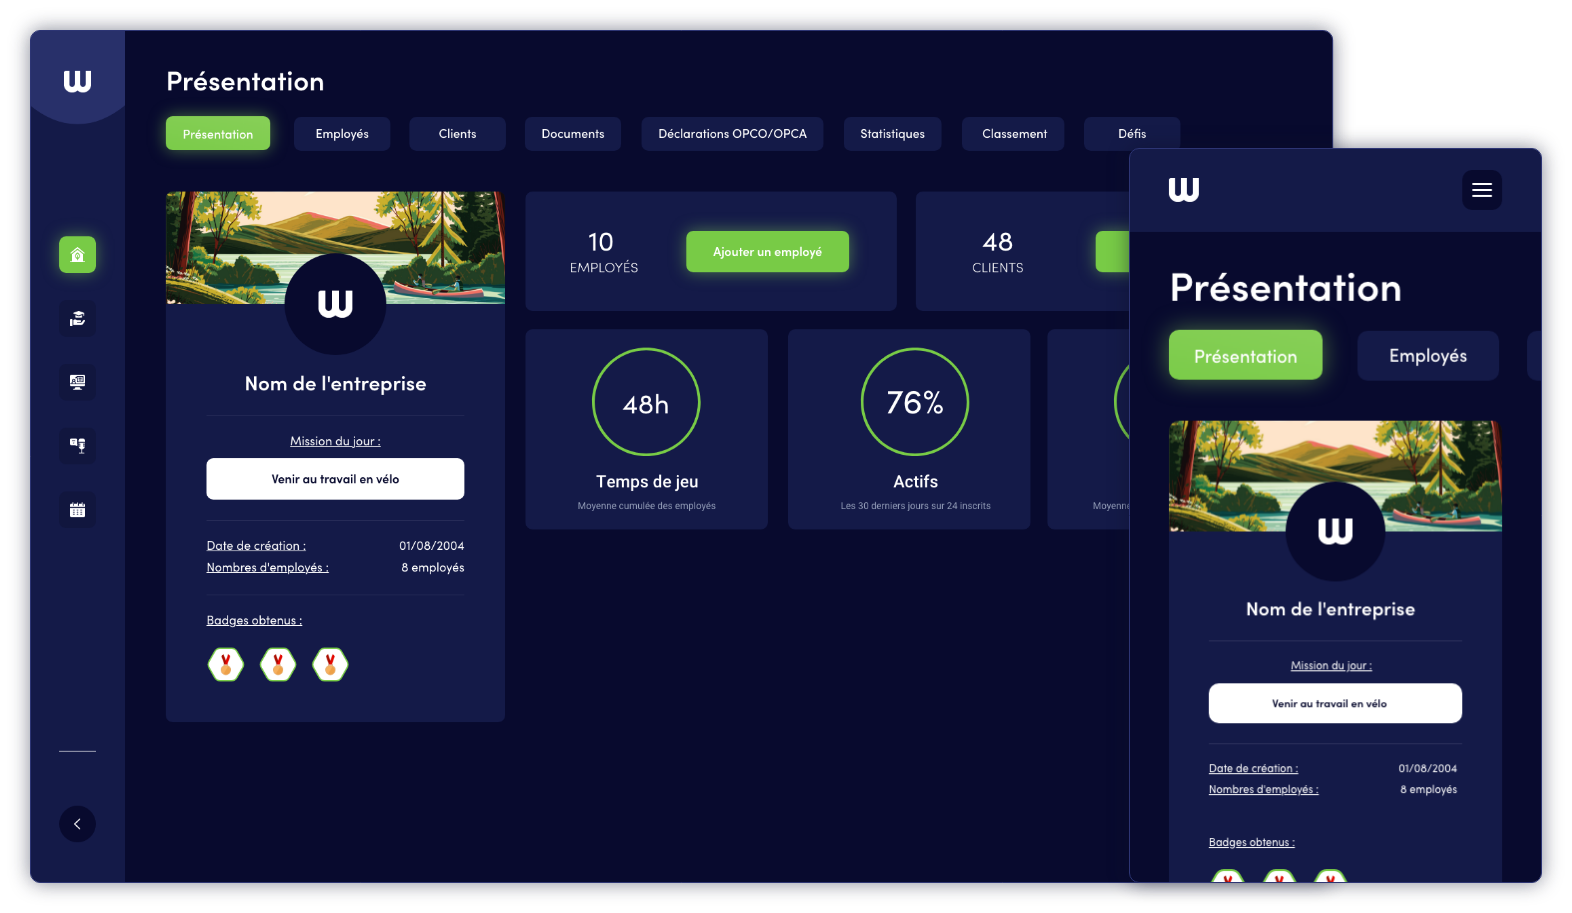 Interface Wenow.